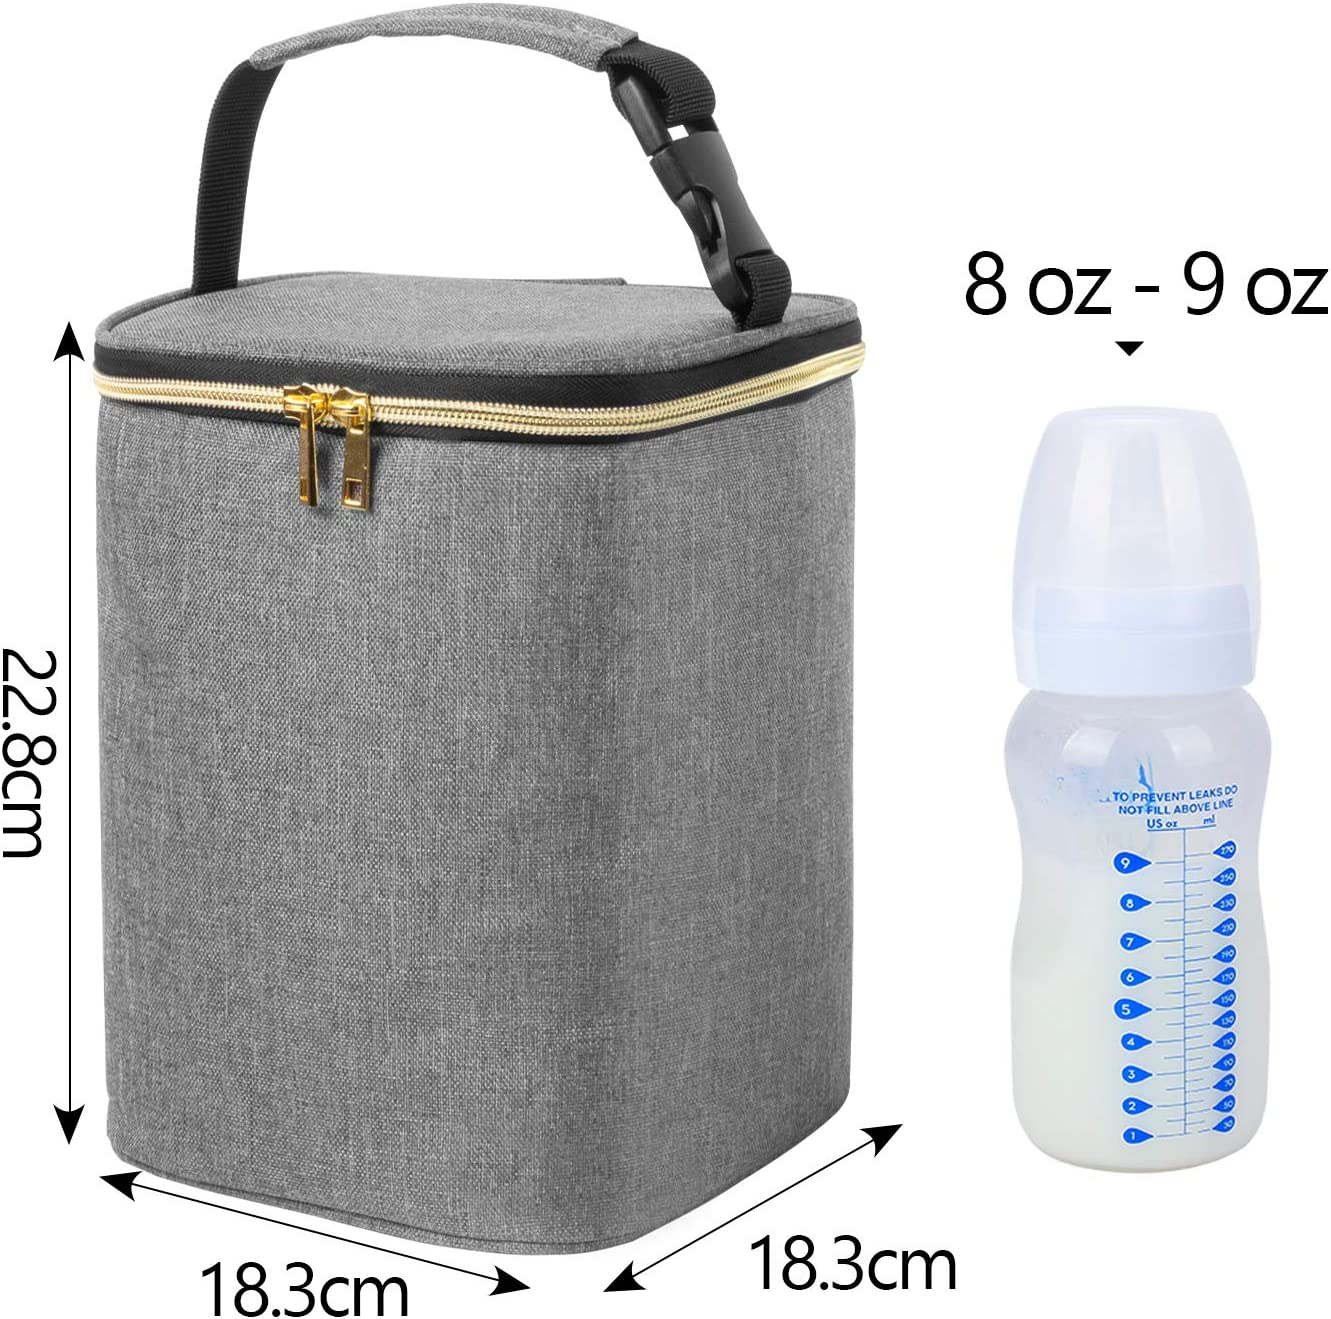 and Ice Pack Baby Bottle Cooler Bag for 4 Baby Breastmilk Bottles up to 270ml Teamoy Breastmilk Cooler Bag Beige Dandelion